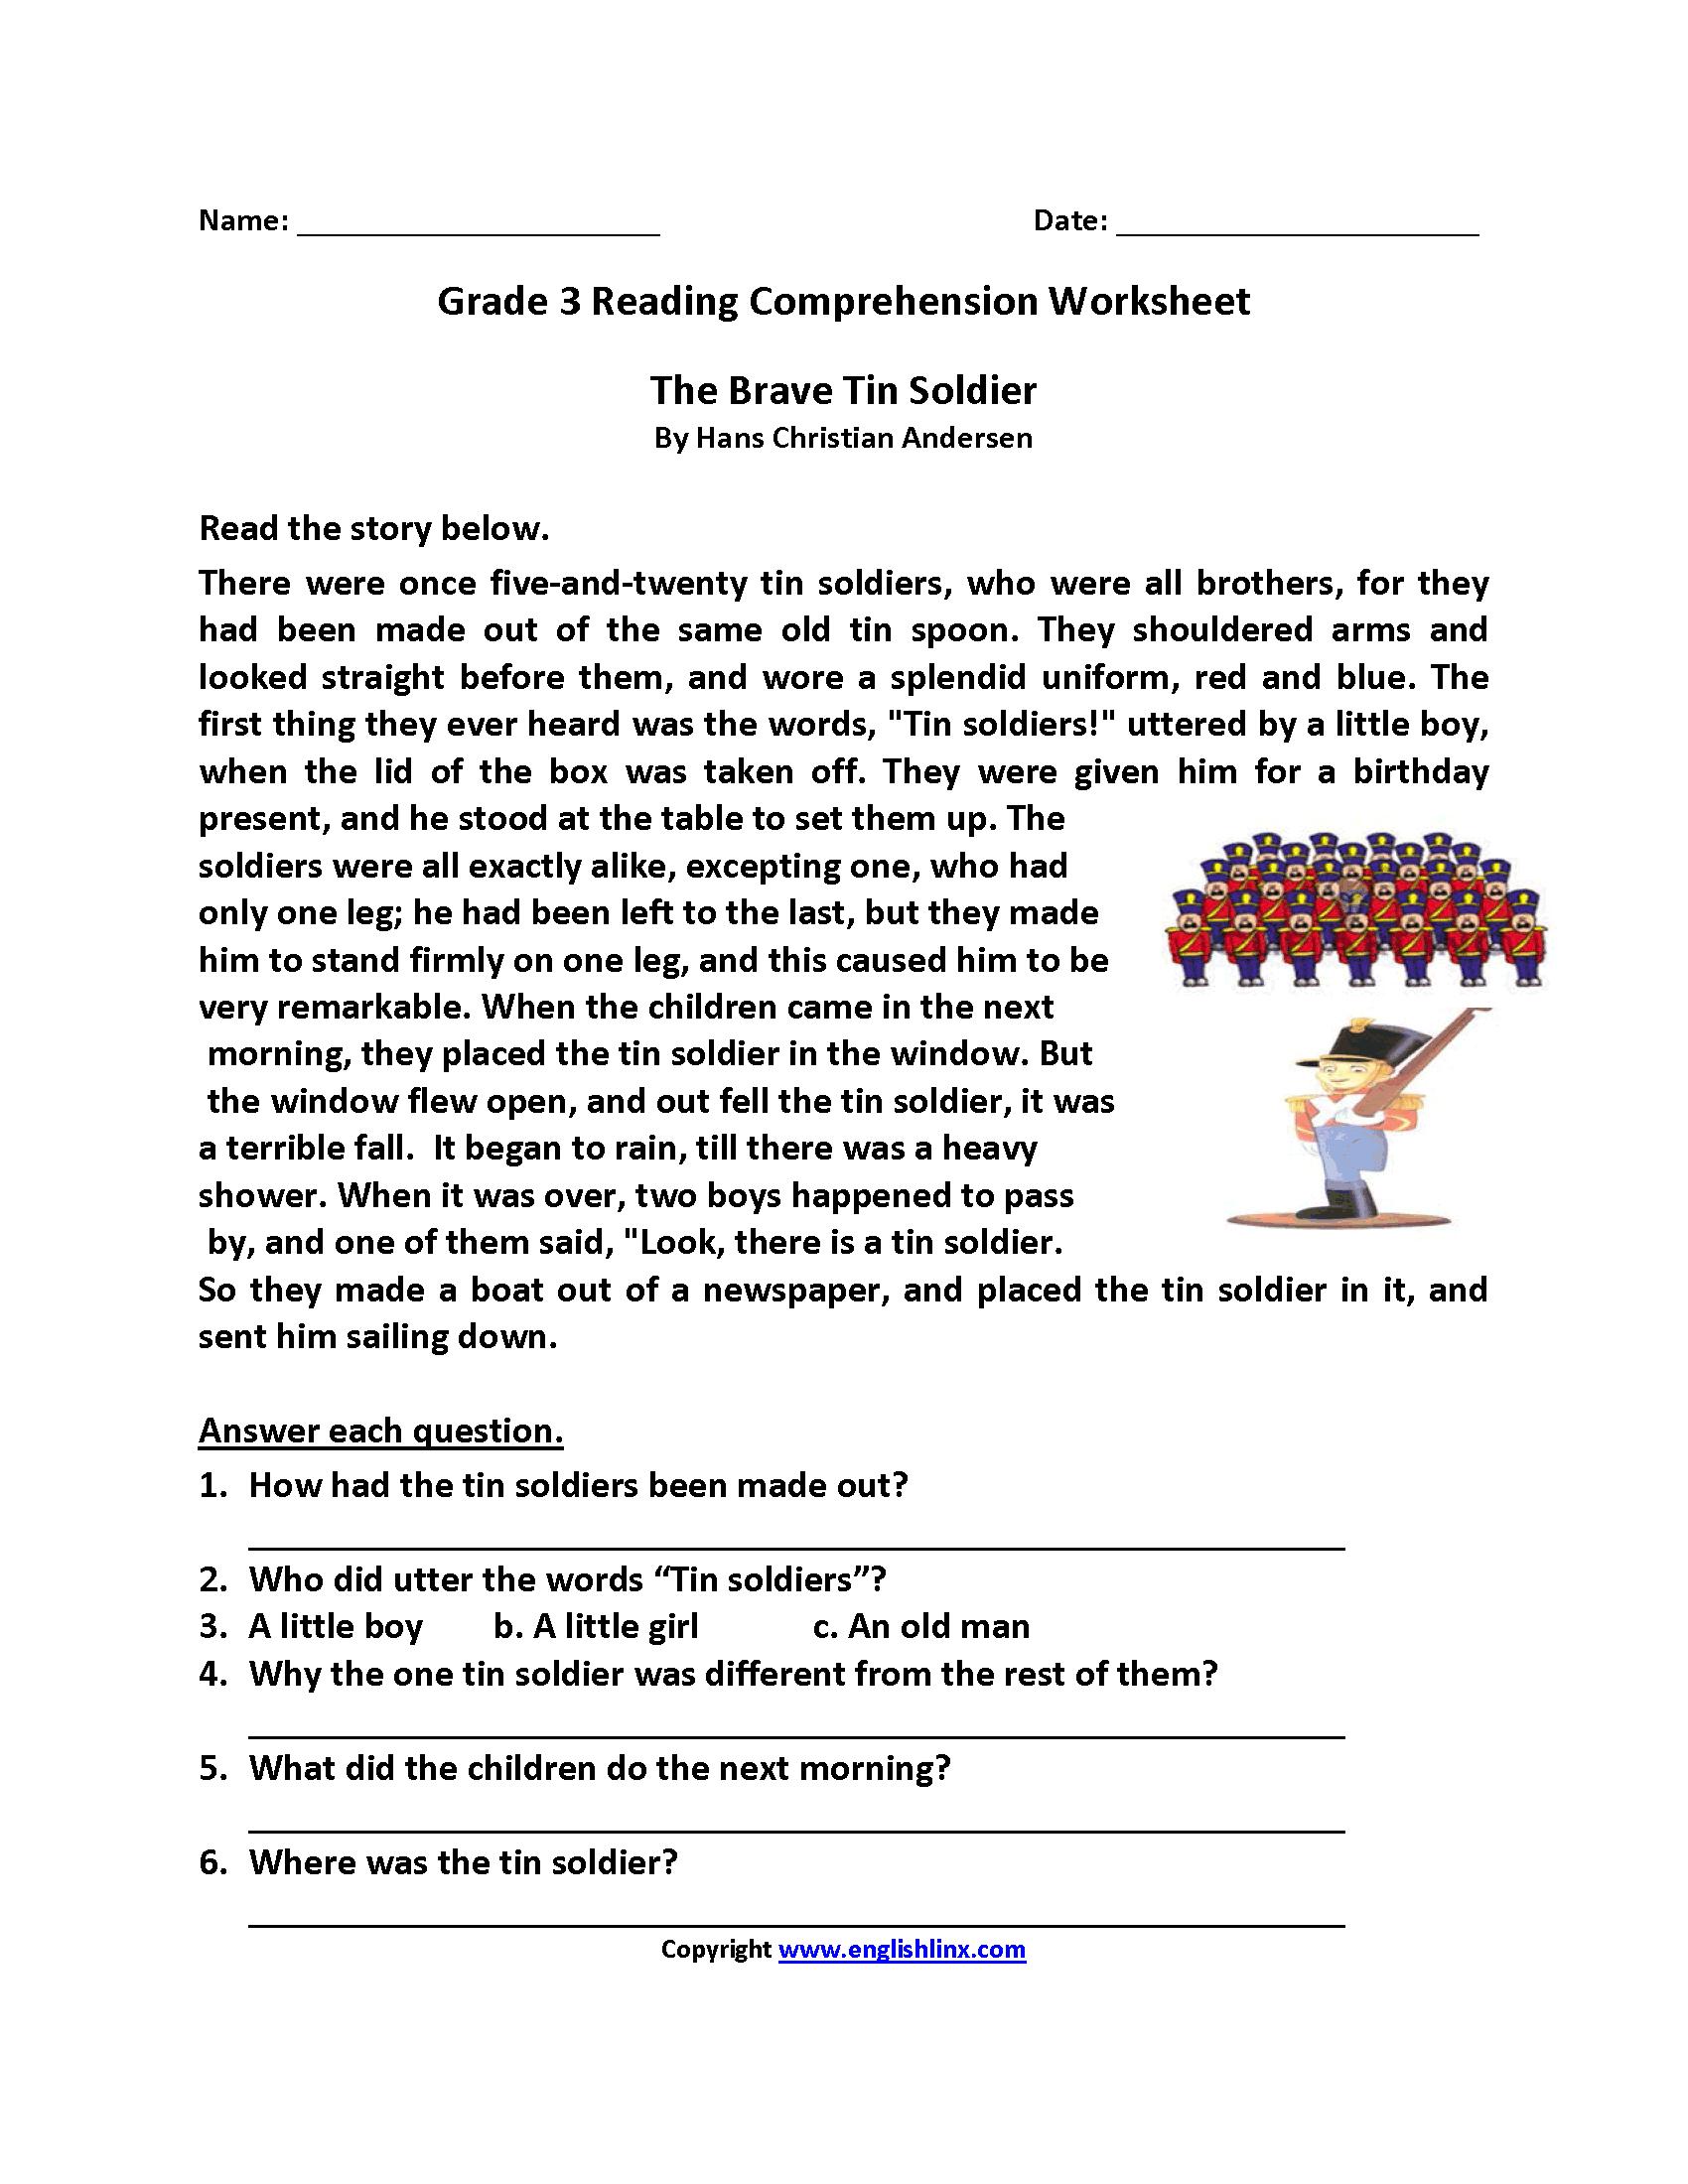 Free Printable Reading Comprehension Worksheets 3Rd Grade For Free - Free Printable Reading Comprehension Worksheets For 3Rd Grade